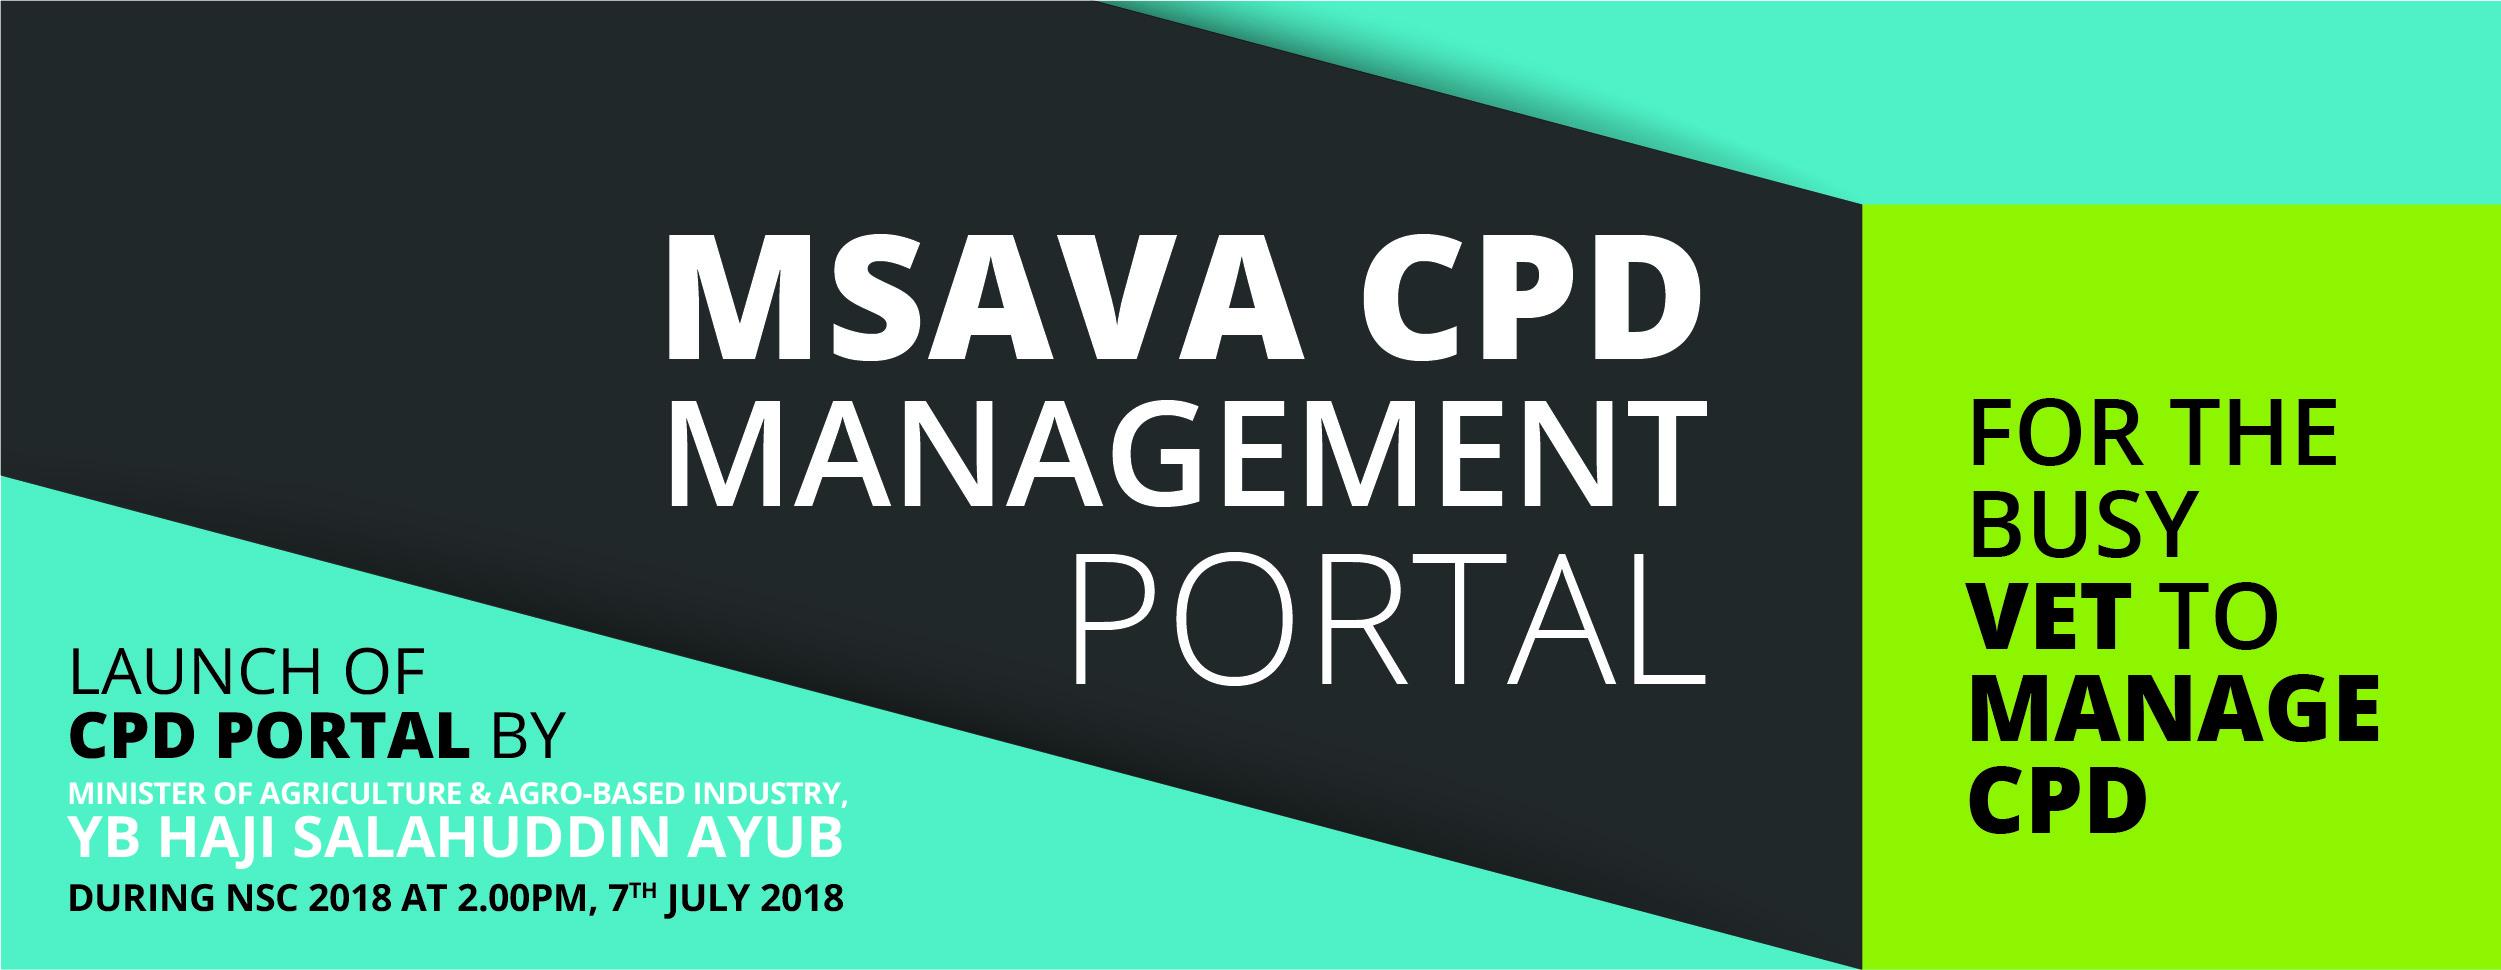 MSAVA CPD MANAGEMENT PORTAL